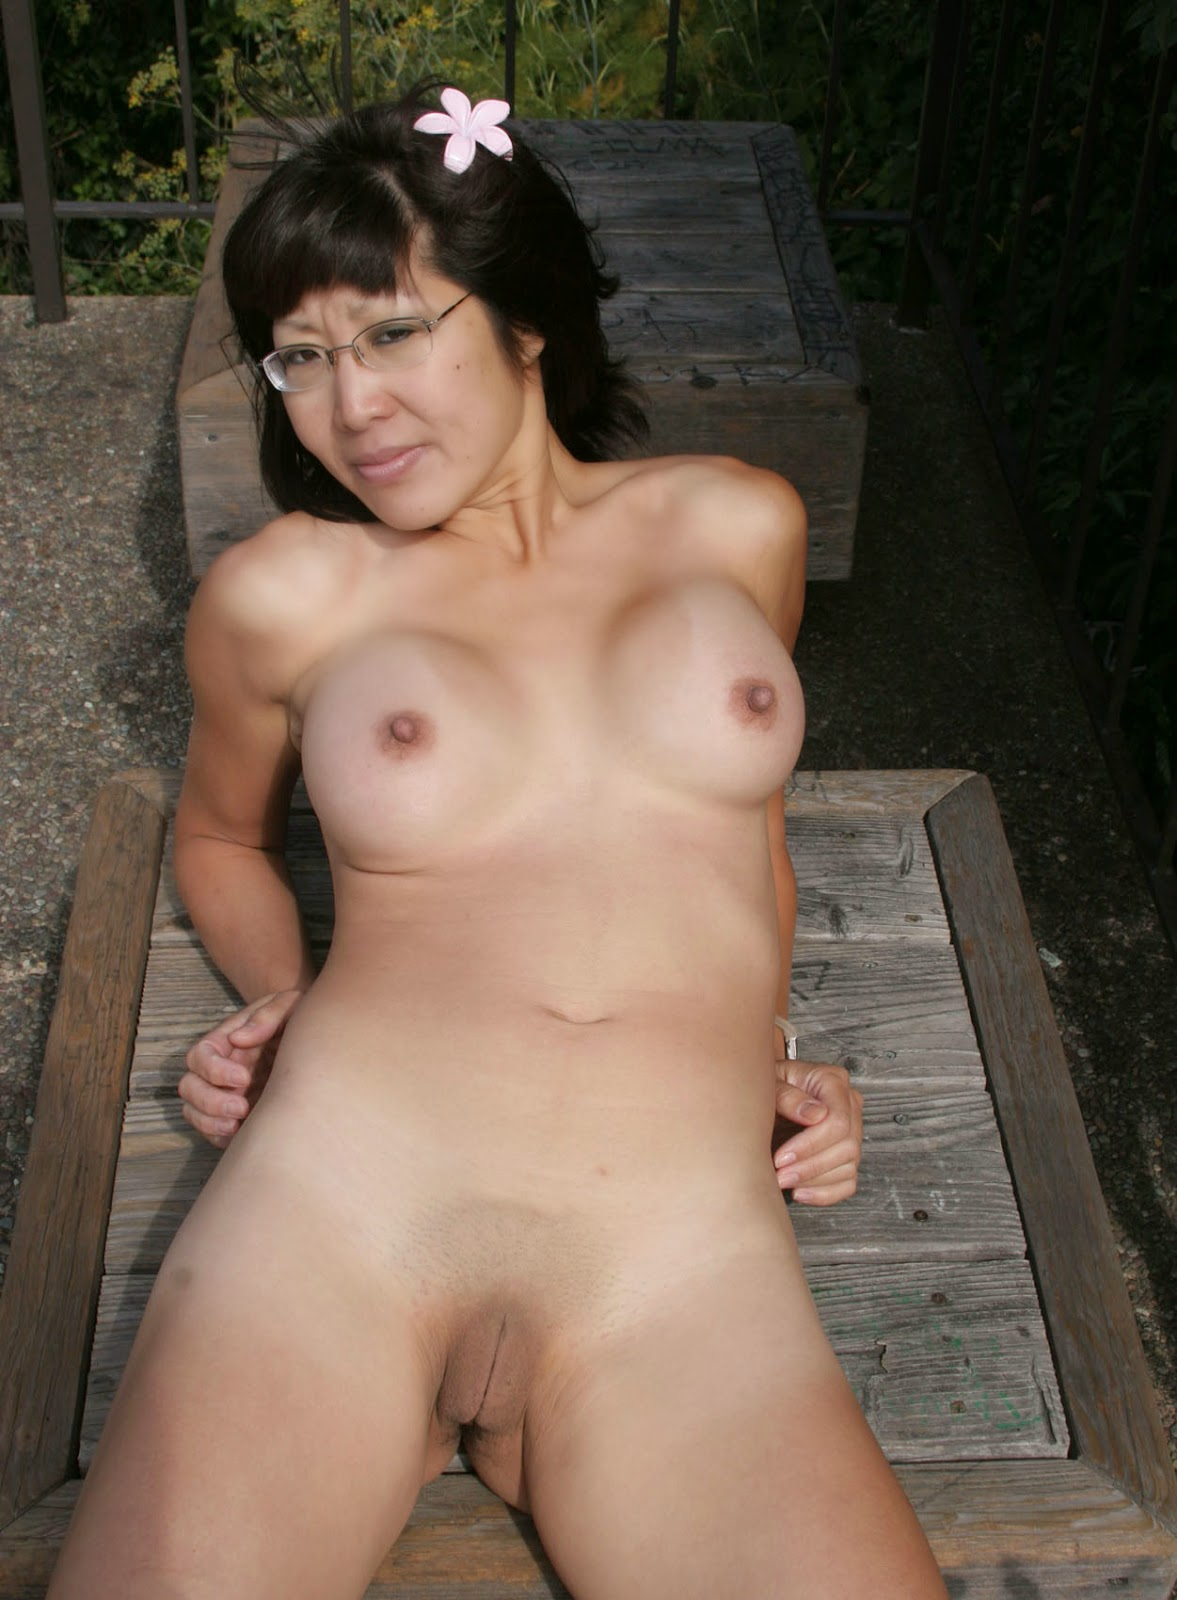 Asian mom nude